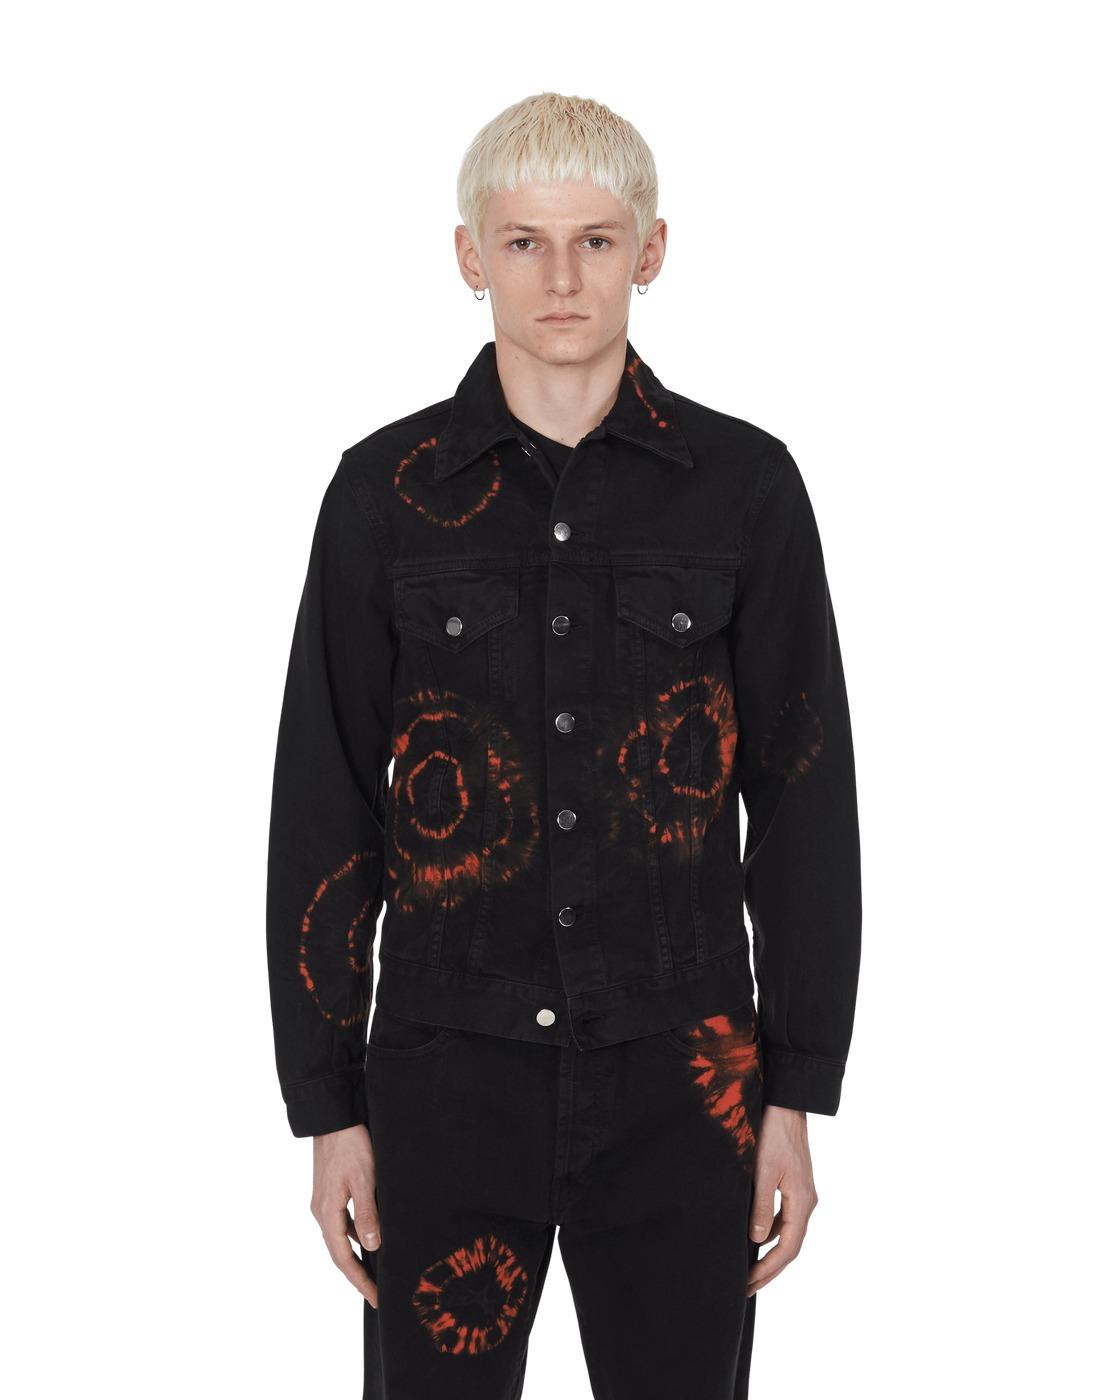 Aries Tie Dye Trucker Jacket Black/Orage